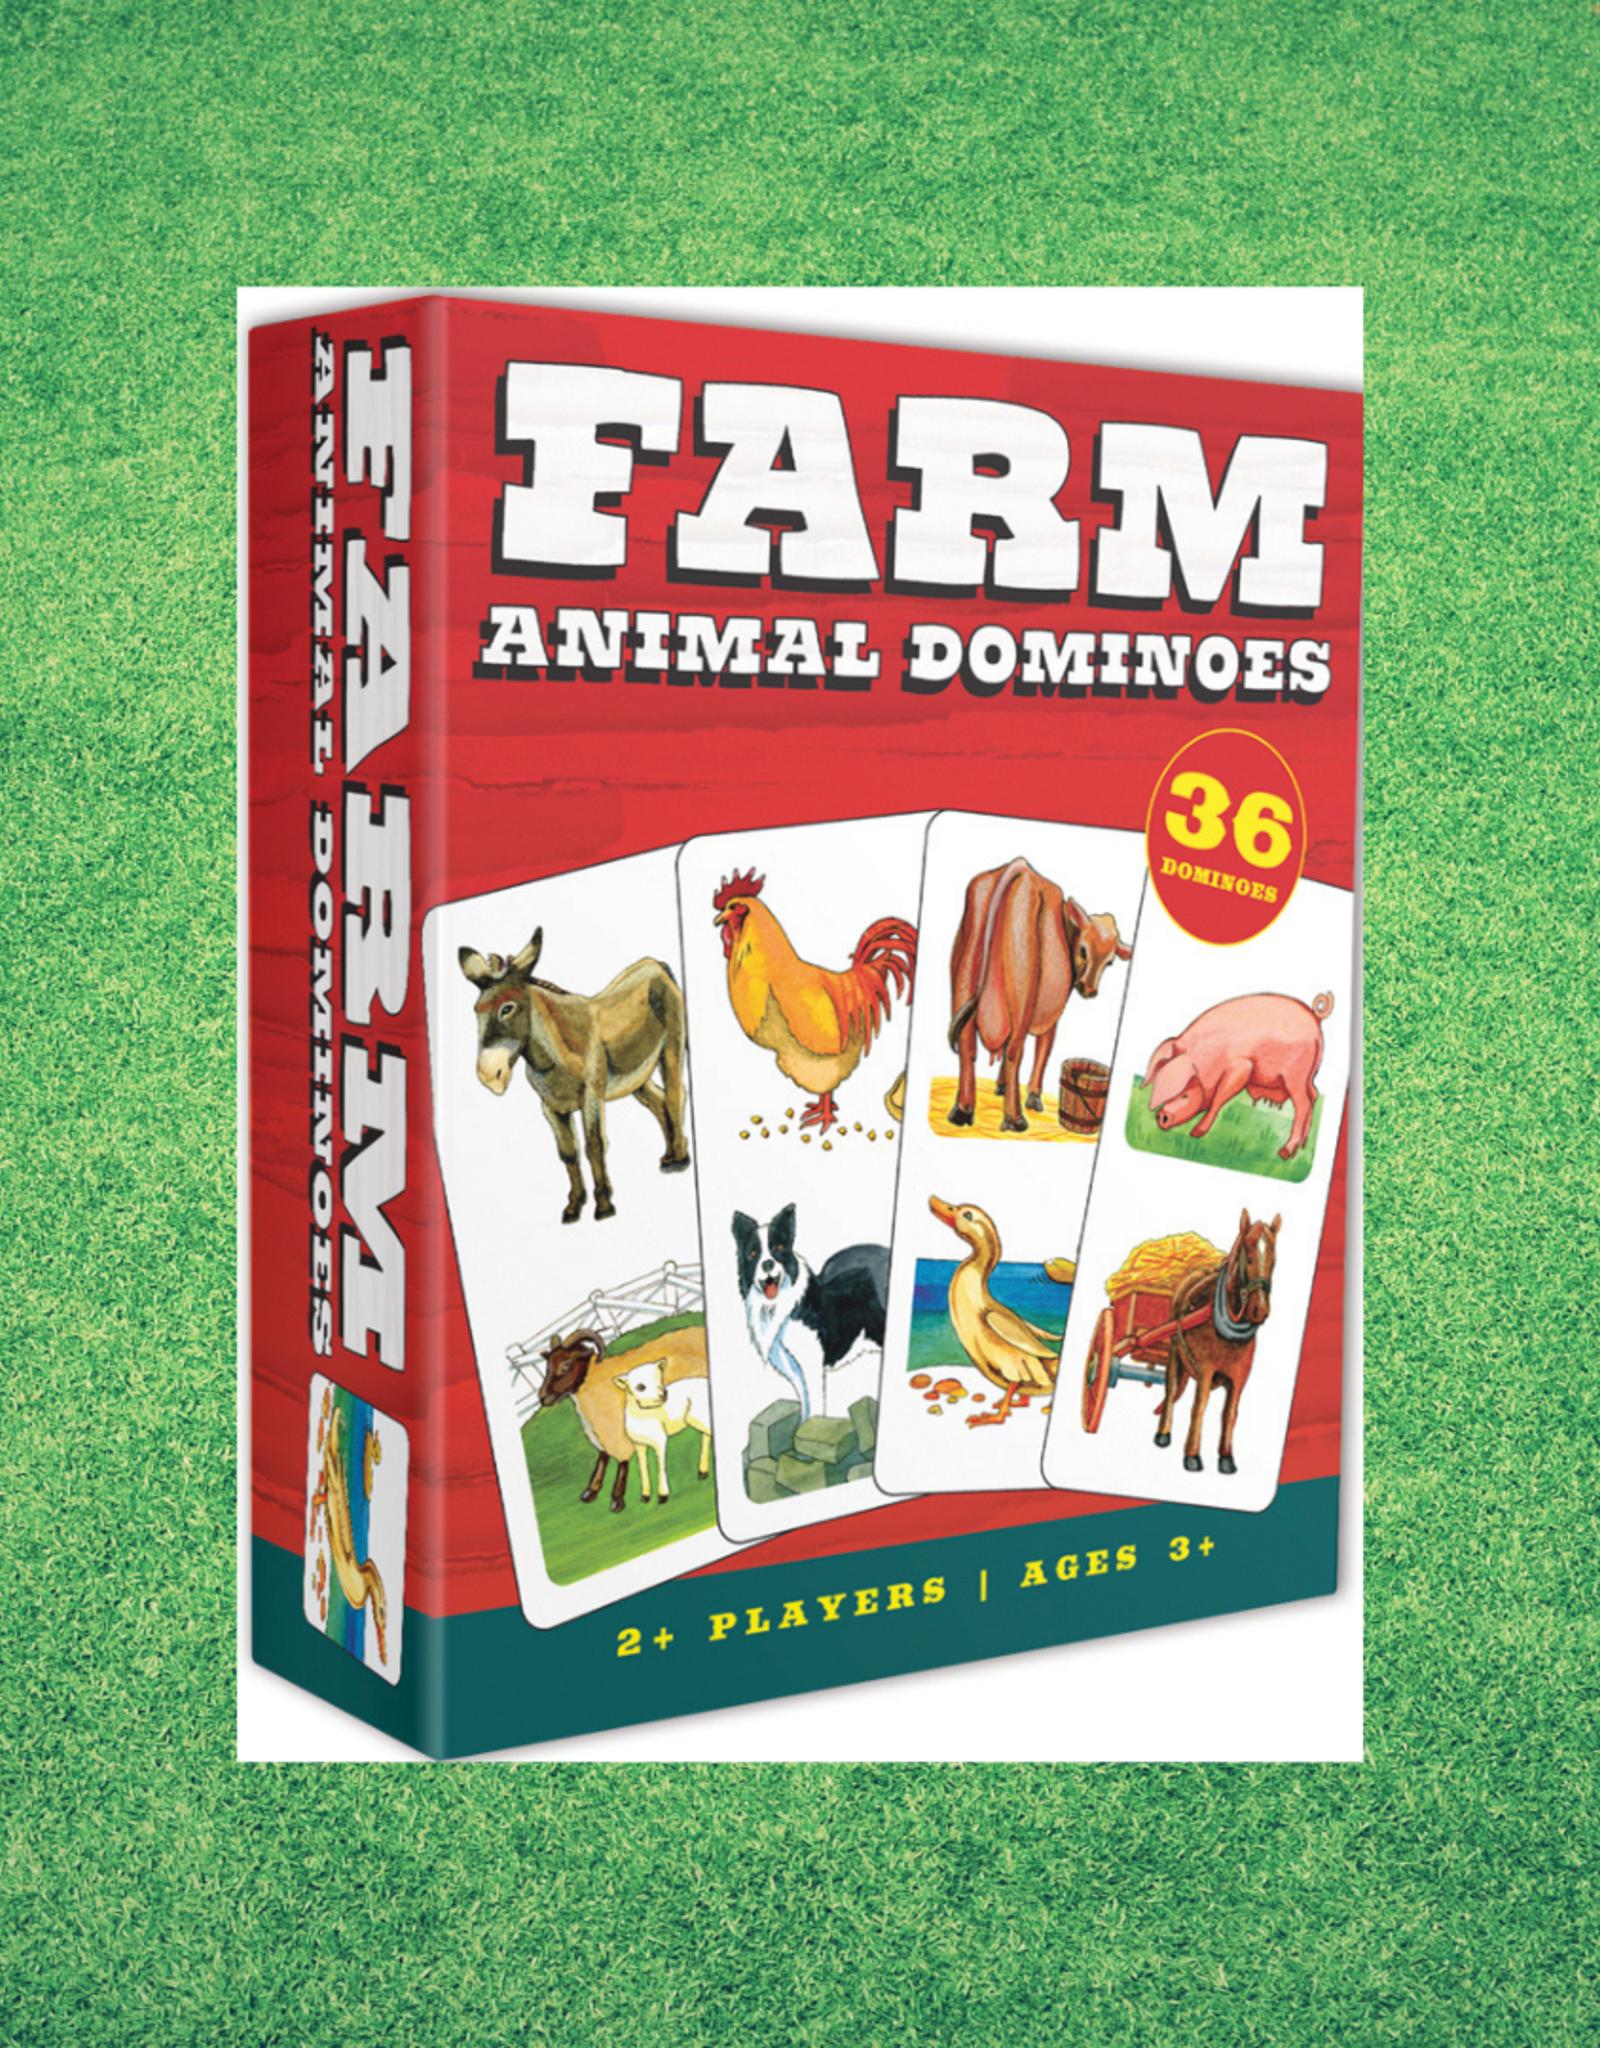 FARM ANIMAL DOMINOES